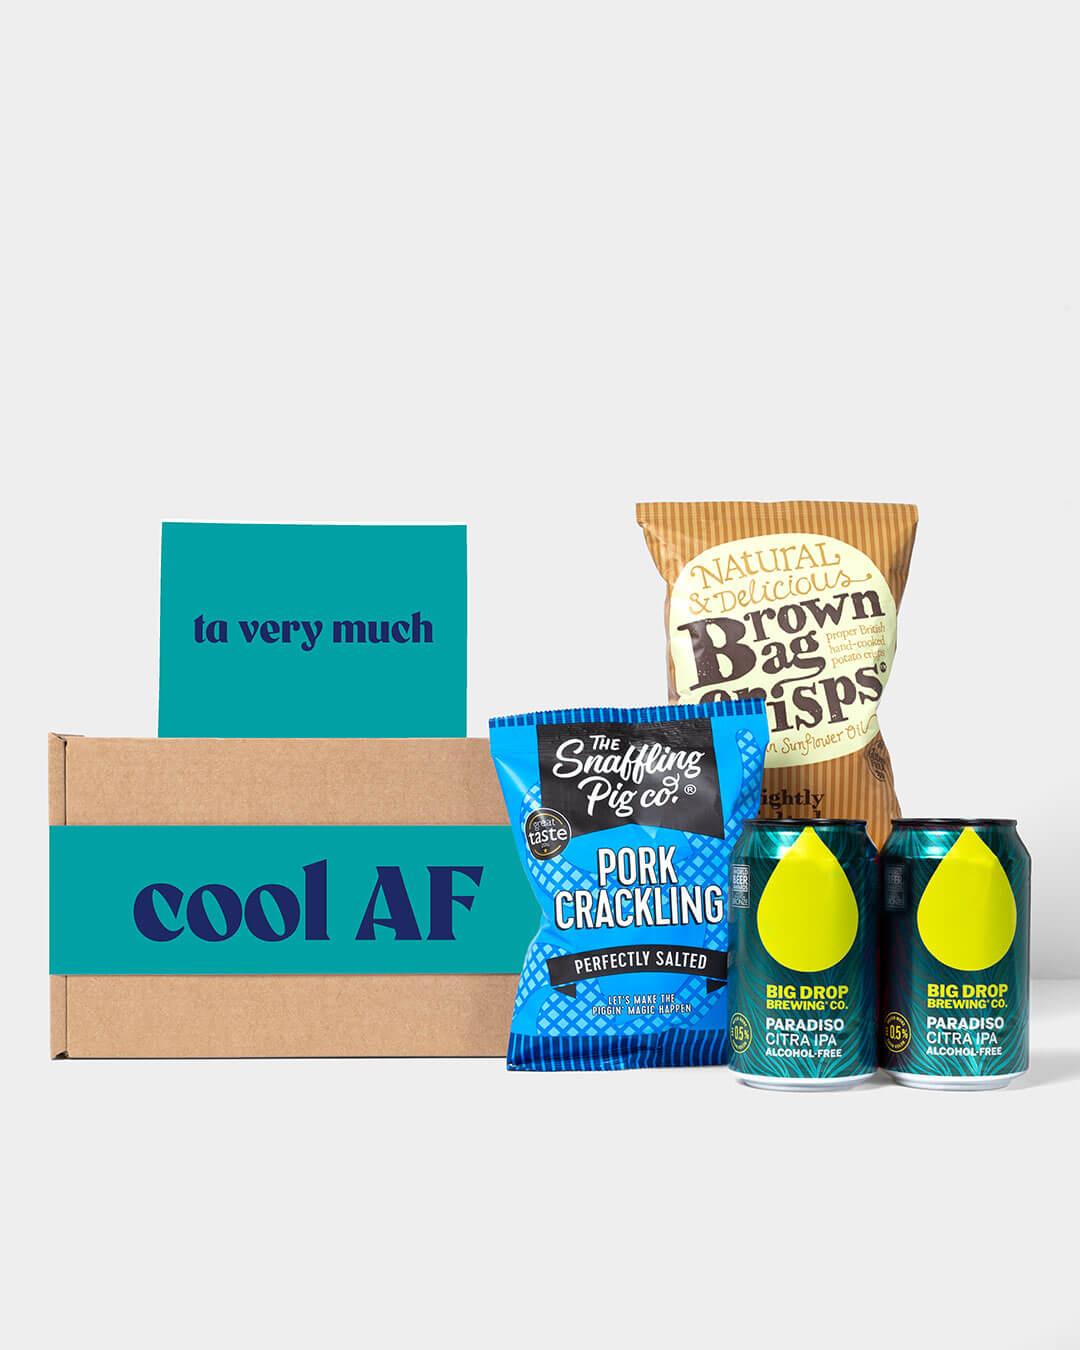 Alcohol Free Beer Box including contents: Big Drop Beer, Snaffling Pig Pork Scratchings & brown Bag crisps